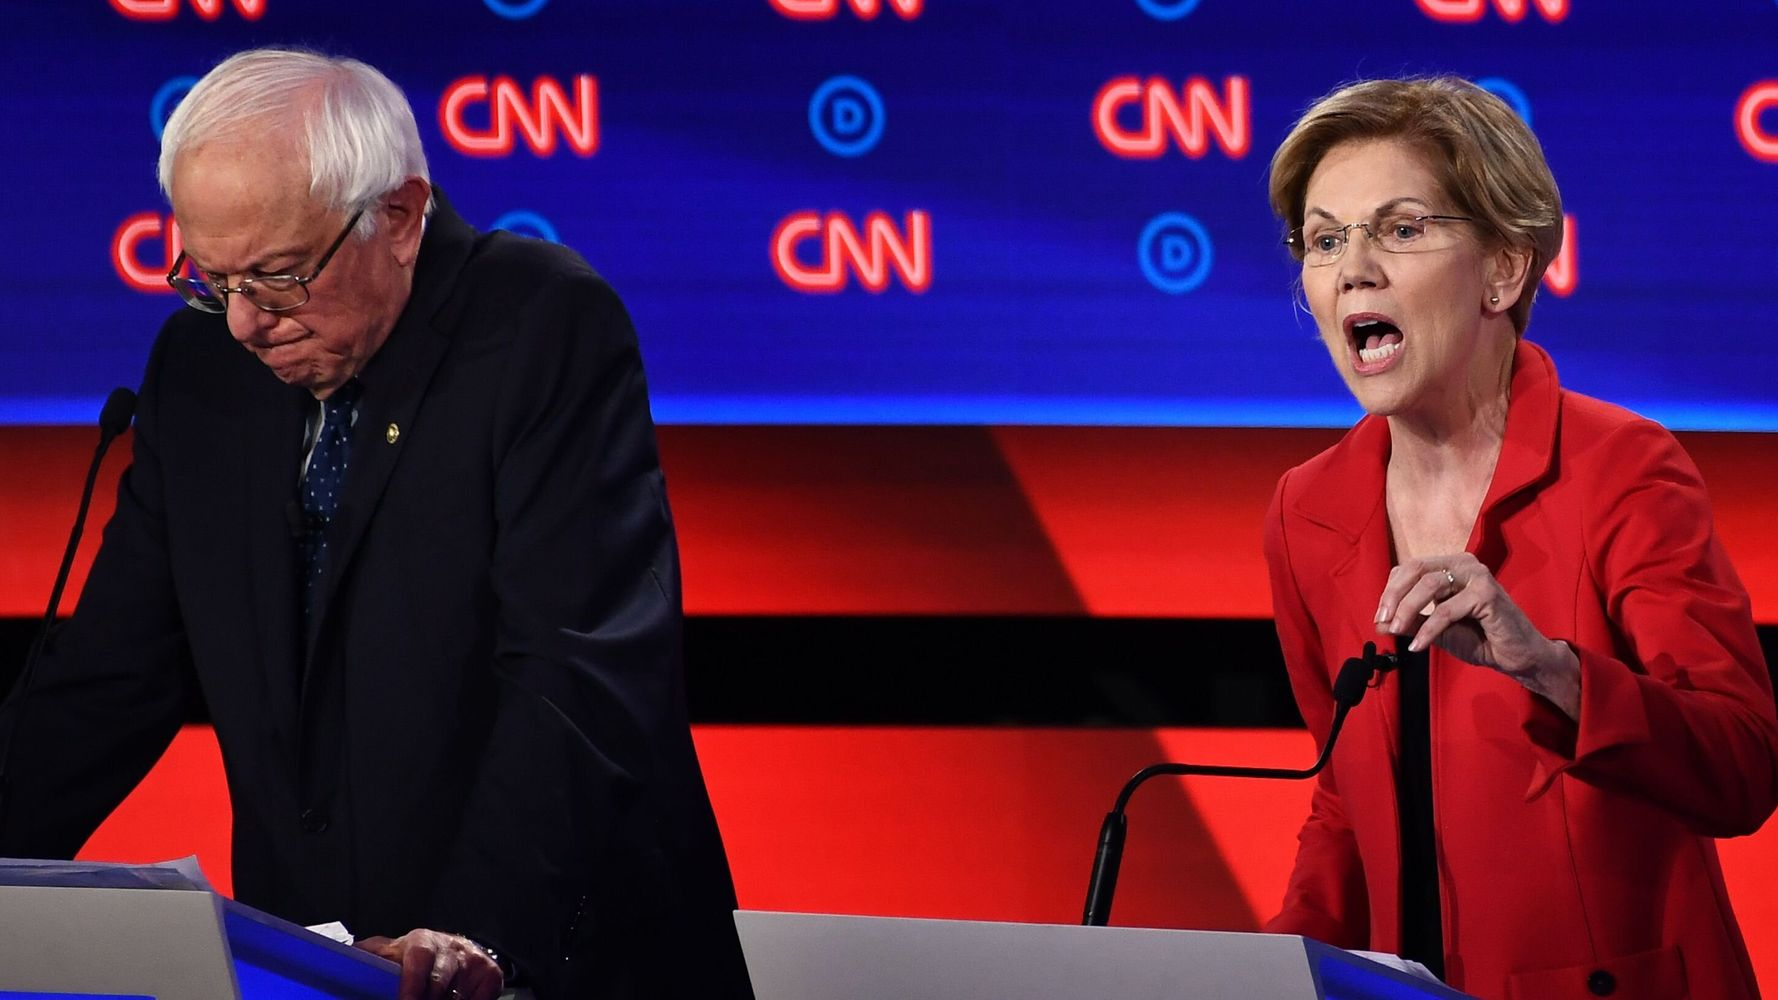 6 Takeaways From Tuesday's Progressives vs. Moderates Debate thumbnail